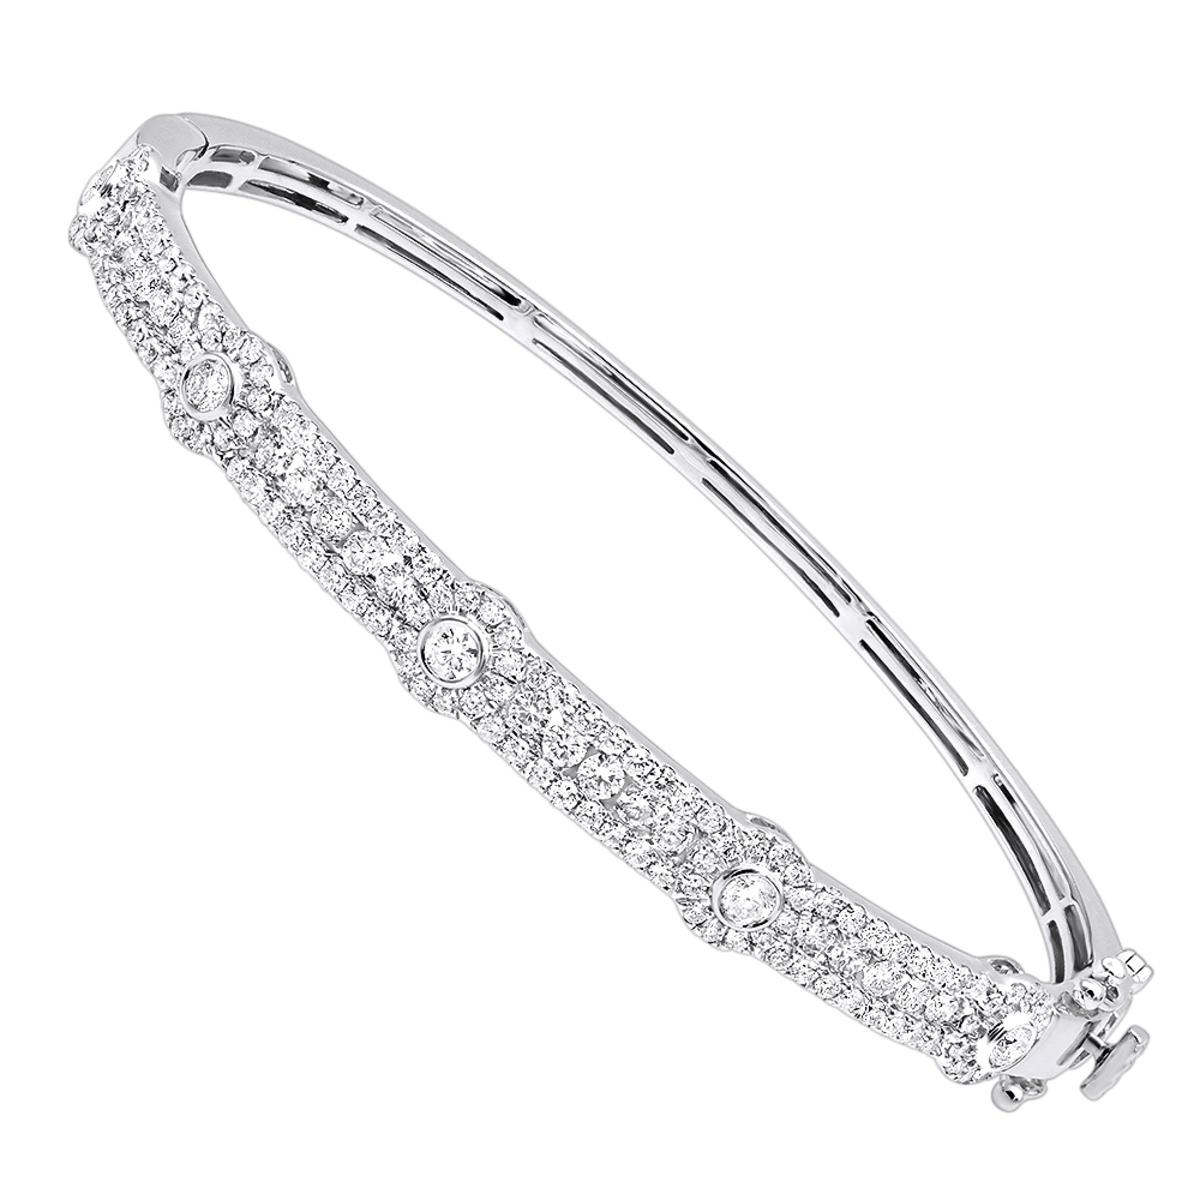 Luxurman Unique Stackable Diamond Bangle Bracelet for Women in 14k Gold 2ct